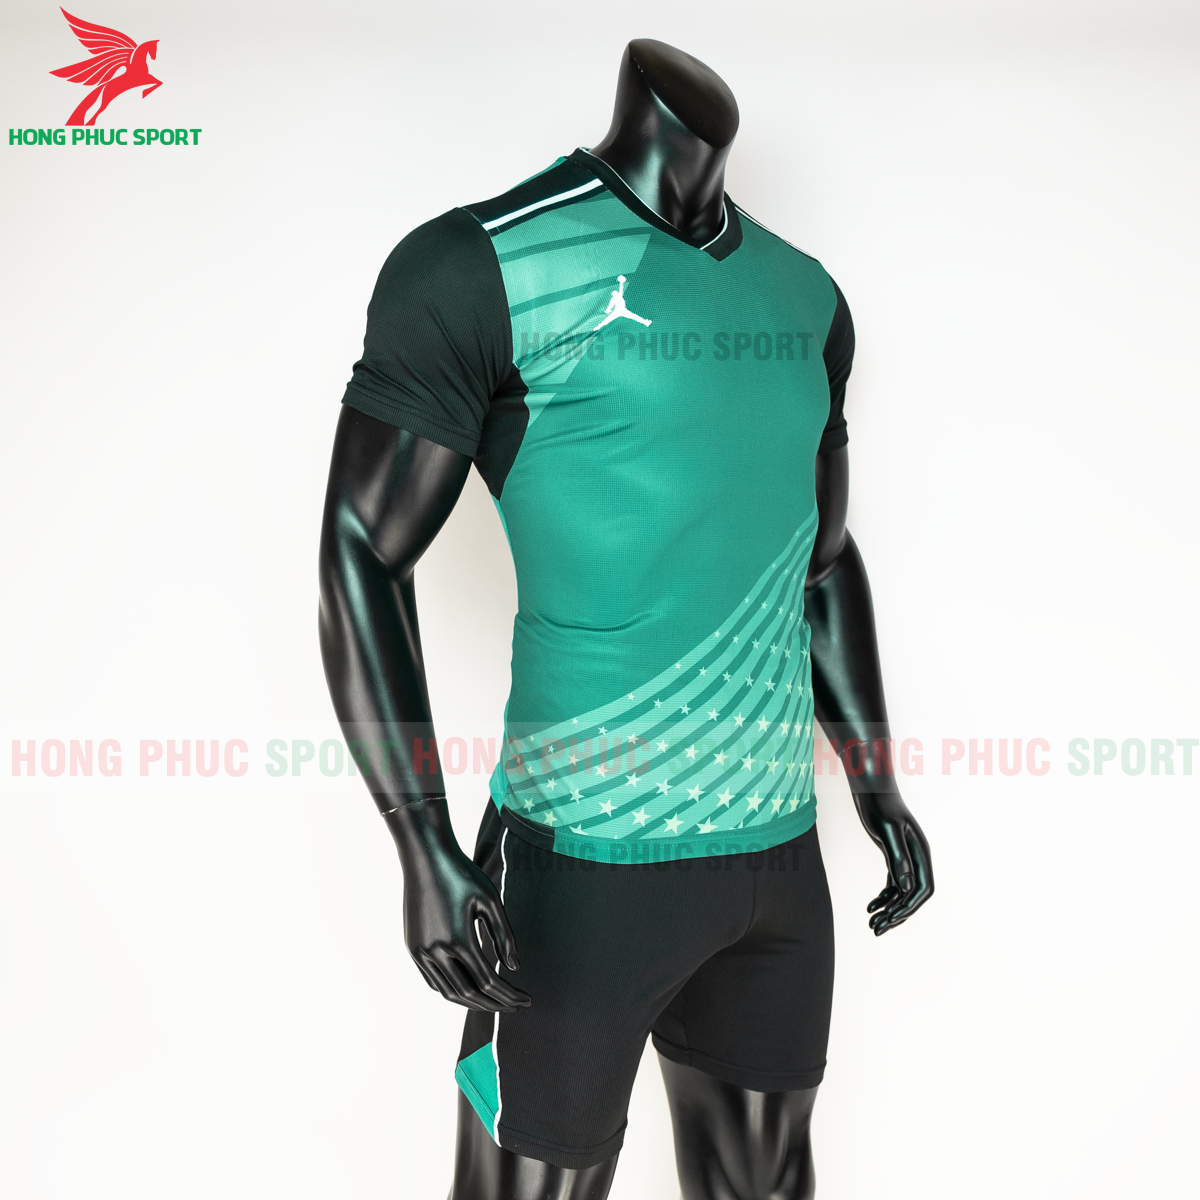 https://cdn.hongphucsport.com/unsafe/s4.shopbay.vn/files/285/ao-bong-chuyen-jordan-20-21-hang-det-mau3-6-5faf43c196834.png